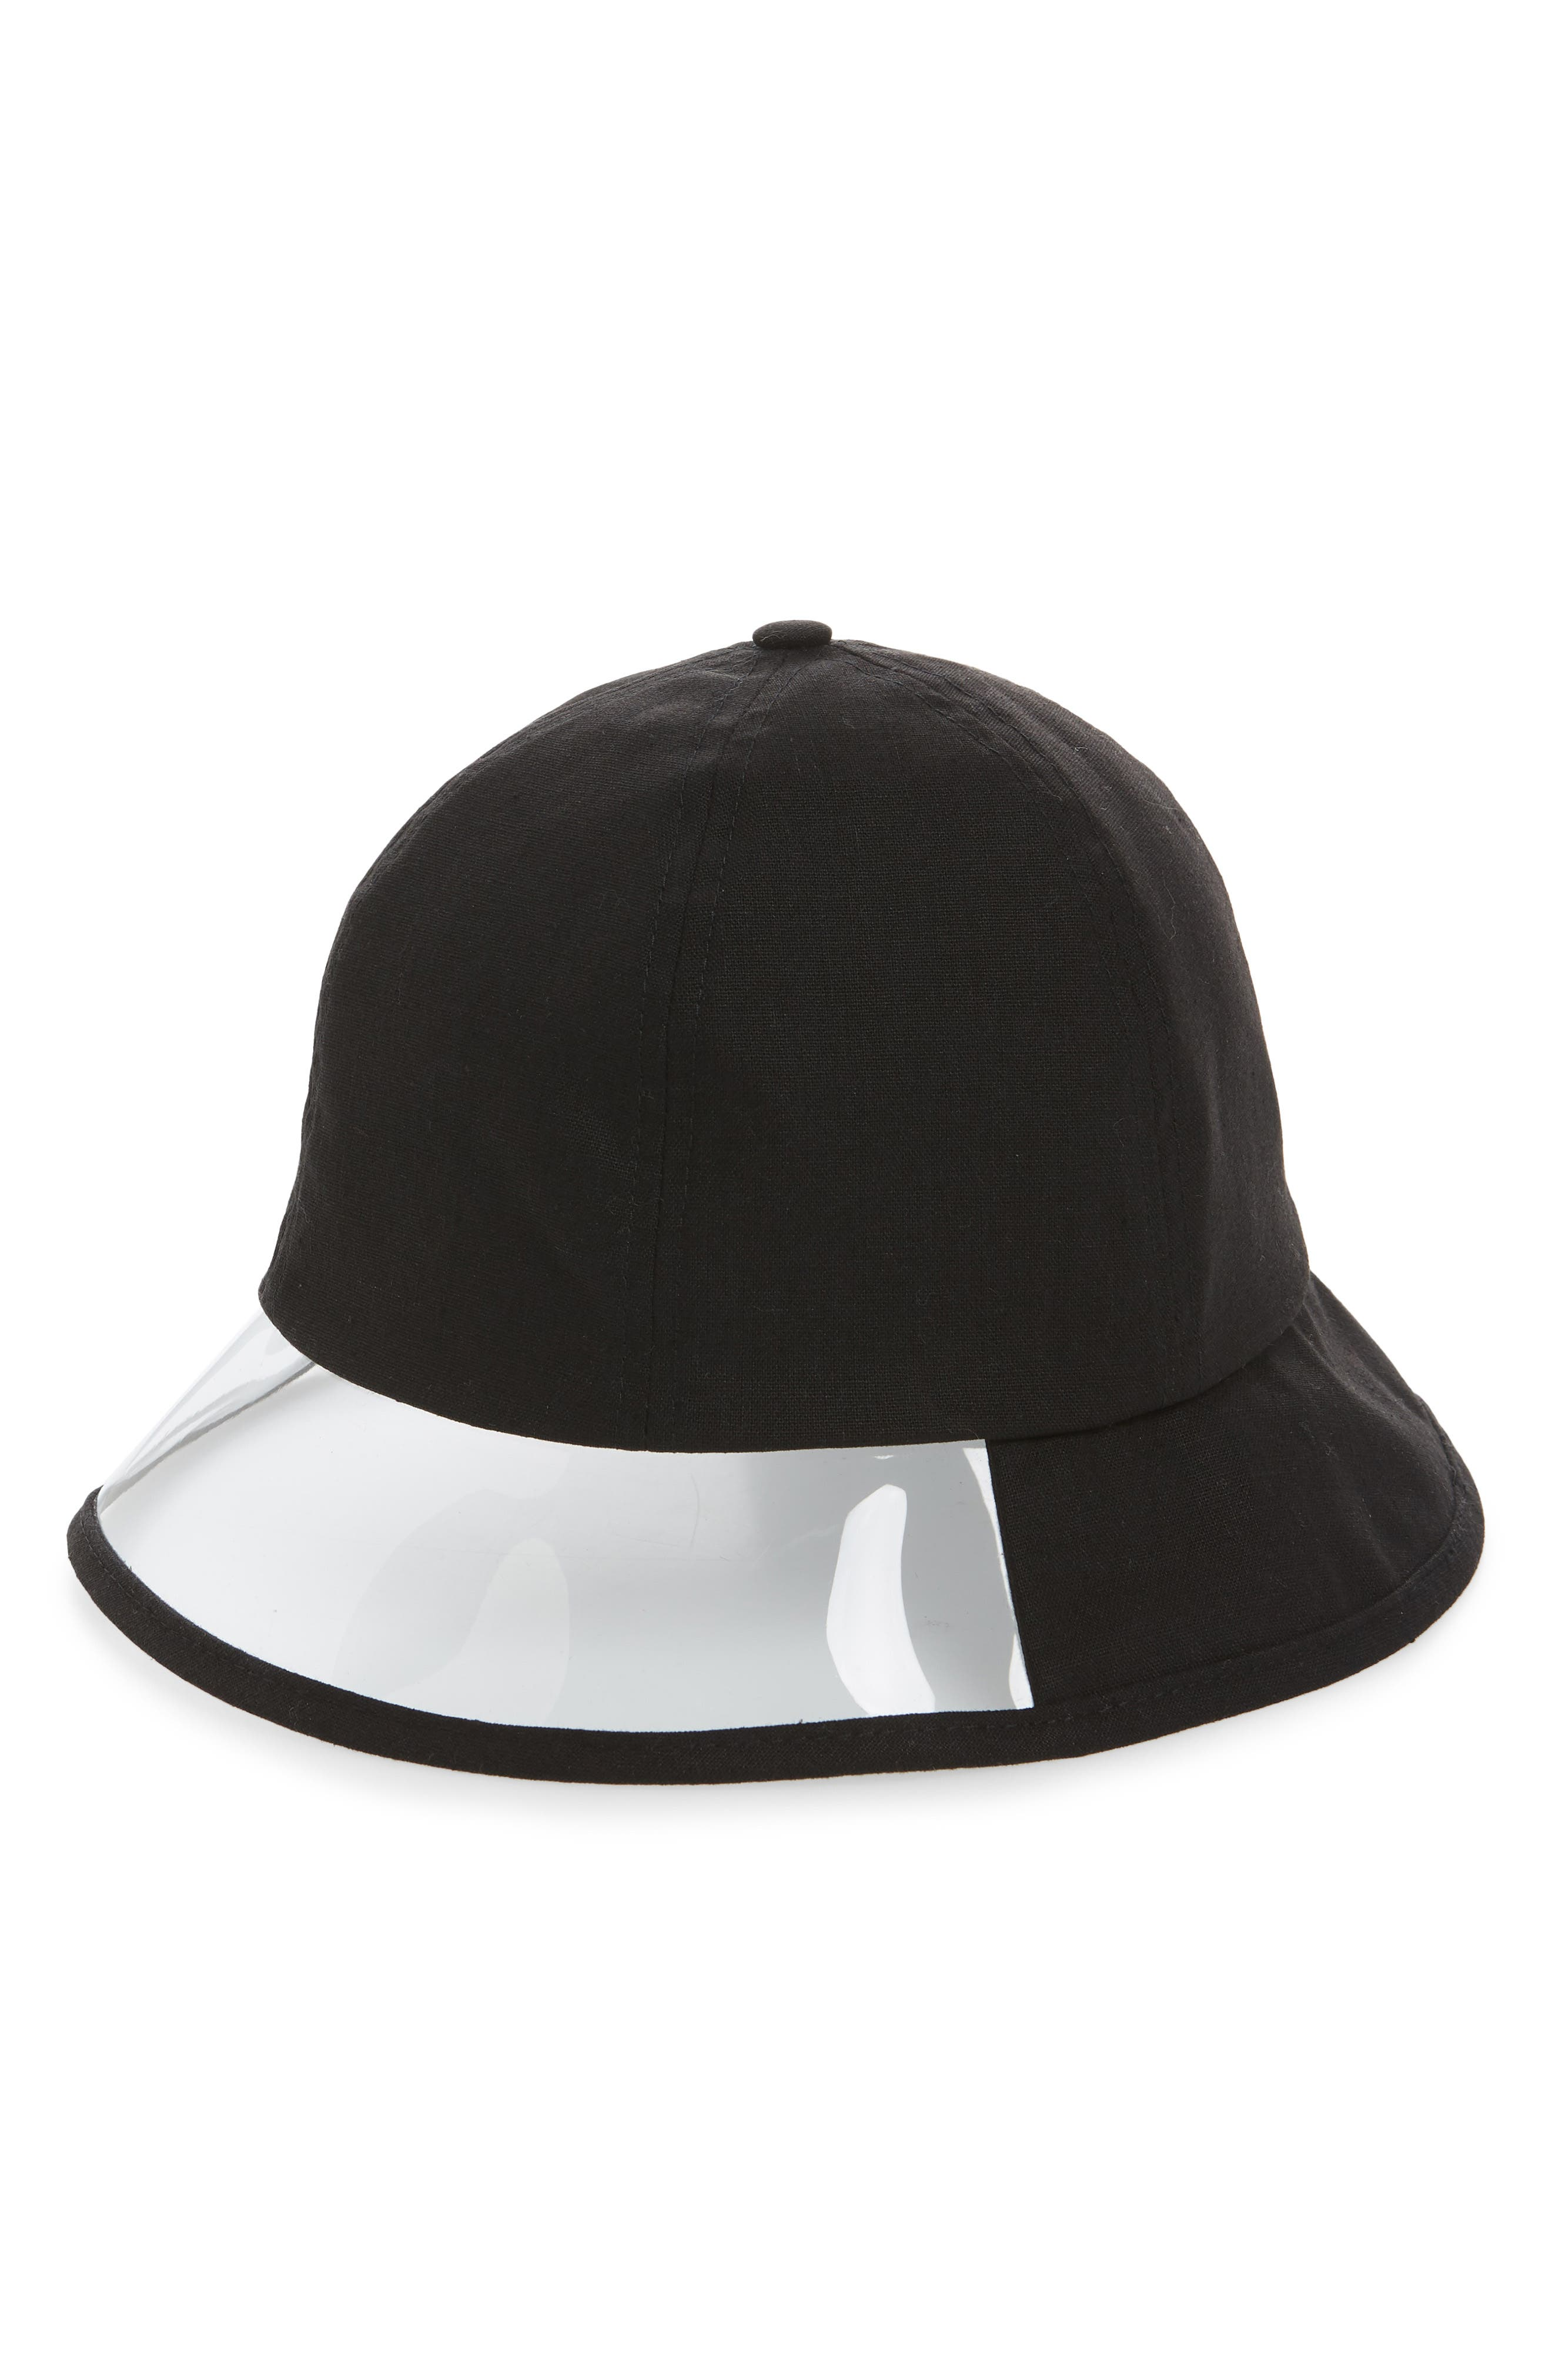 STEVE MADDEN Transparent Panel Canvas Bucket Hat, Main, color, BLACK